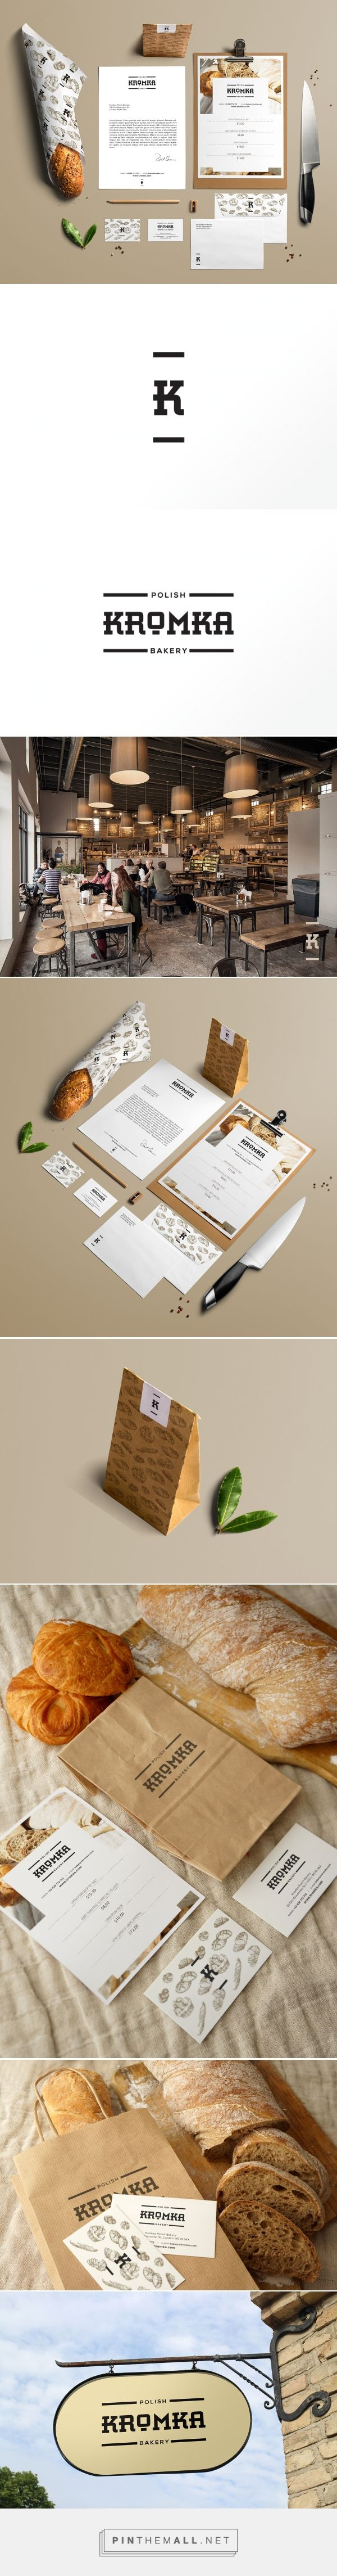 Kromka Polish Bakery packaging branding on Behance by Sebastian Bednark curated by Packaging Diva PD. Let's eat : )